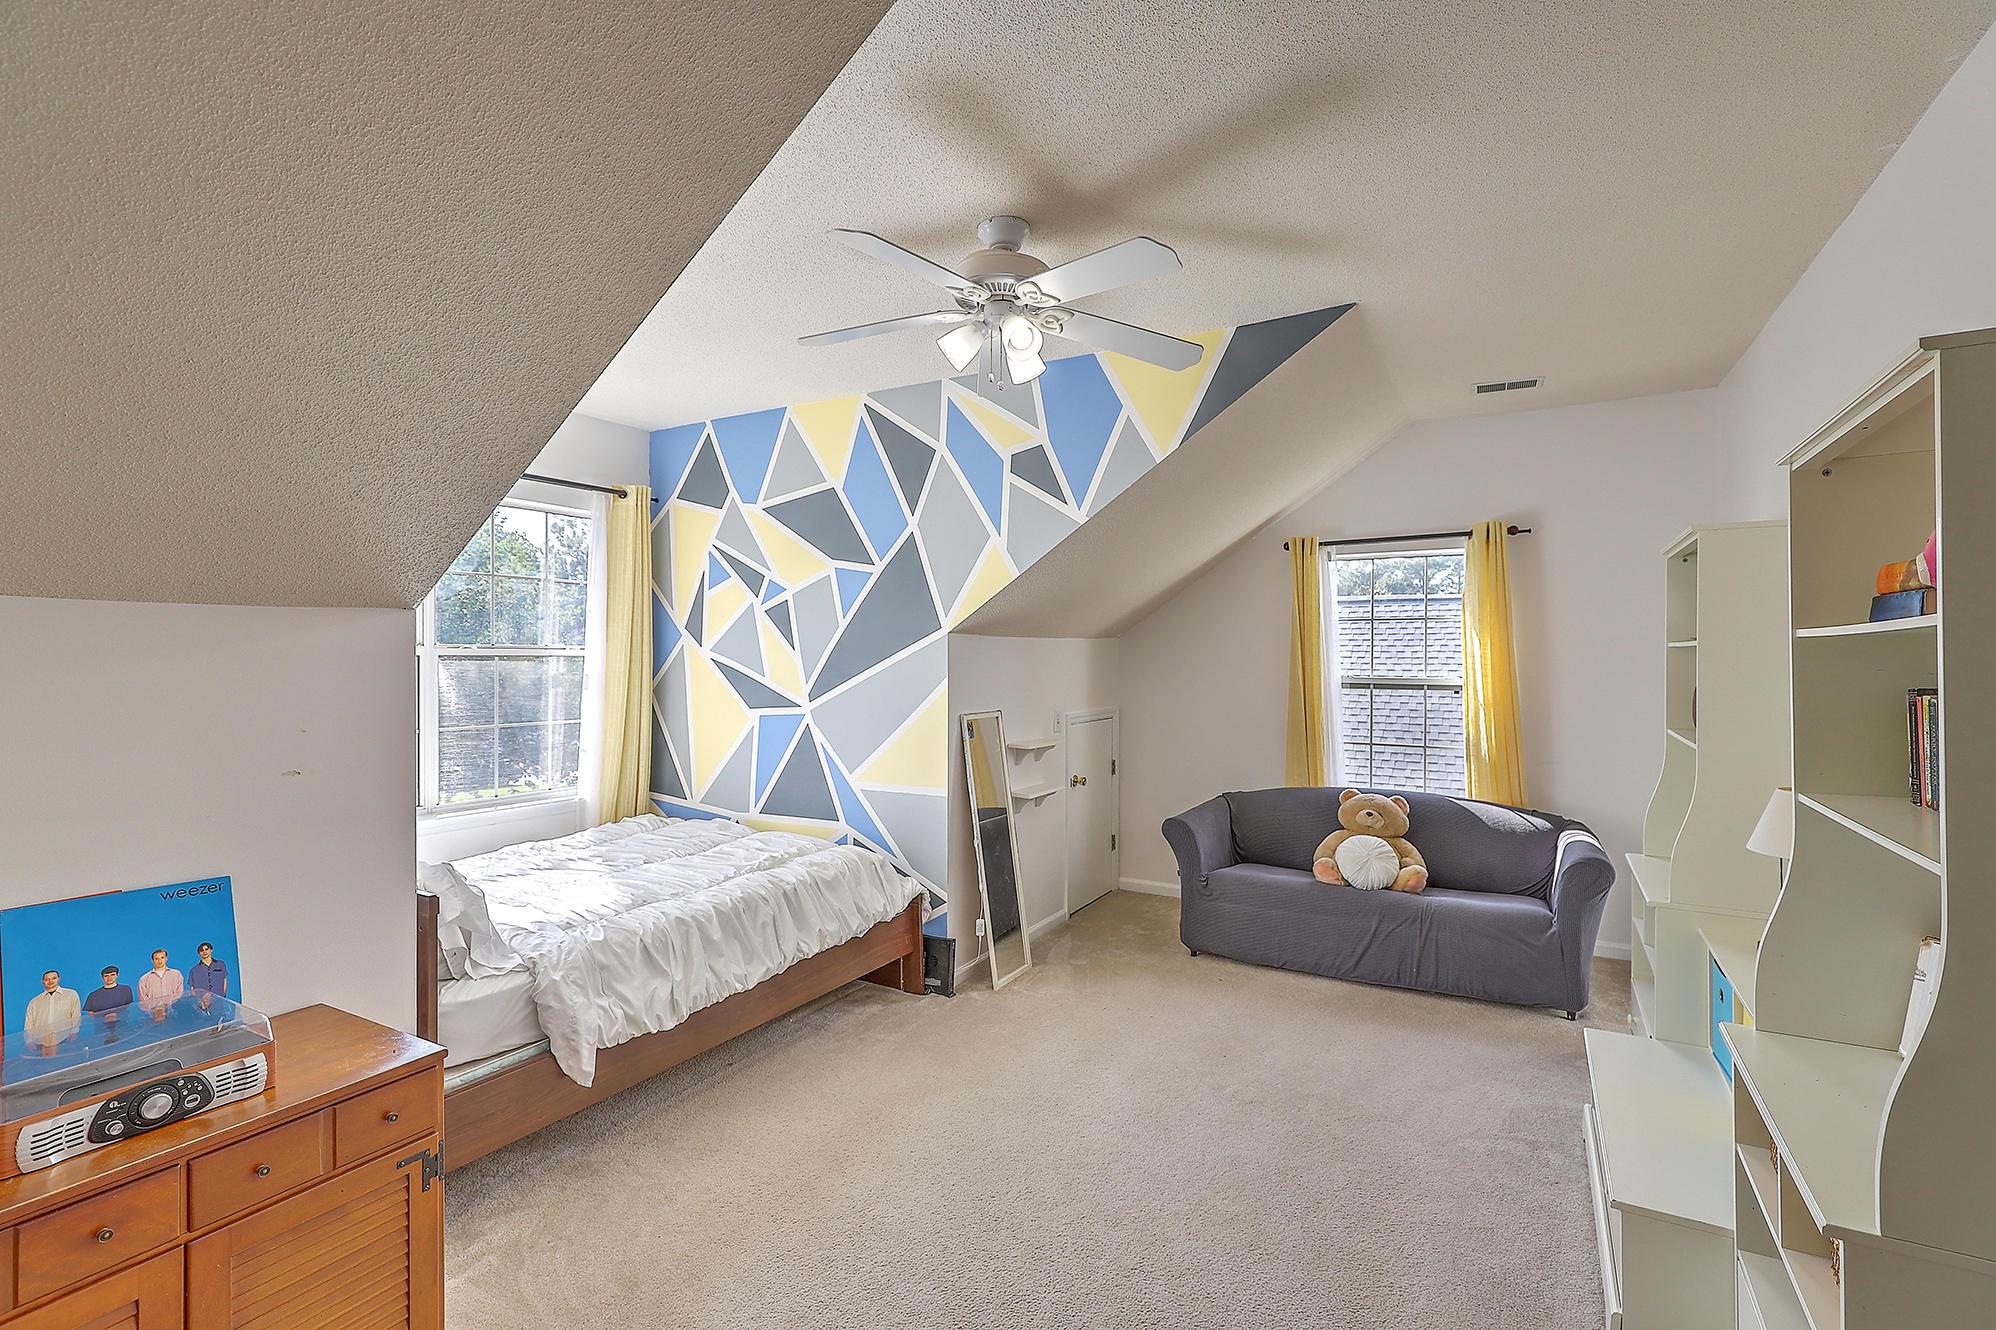 Belle Hall Homes For Sale - 106 Revolution, Mount Pleasant, SC - 23